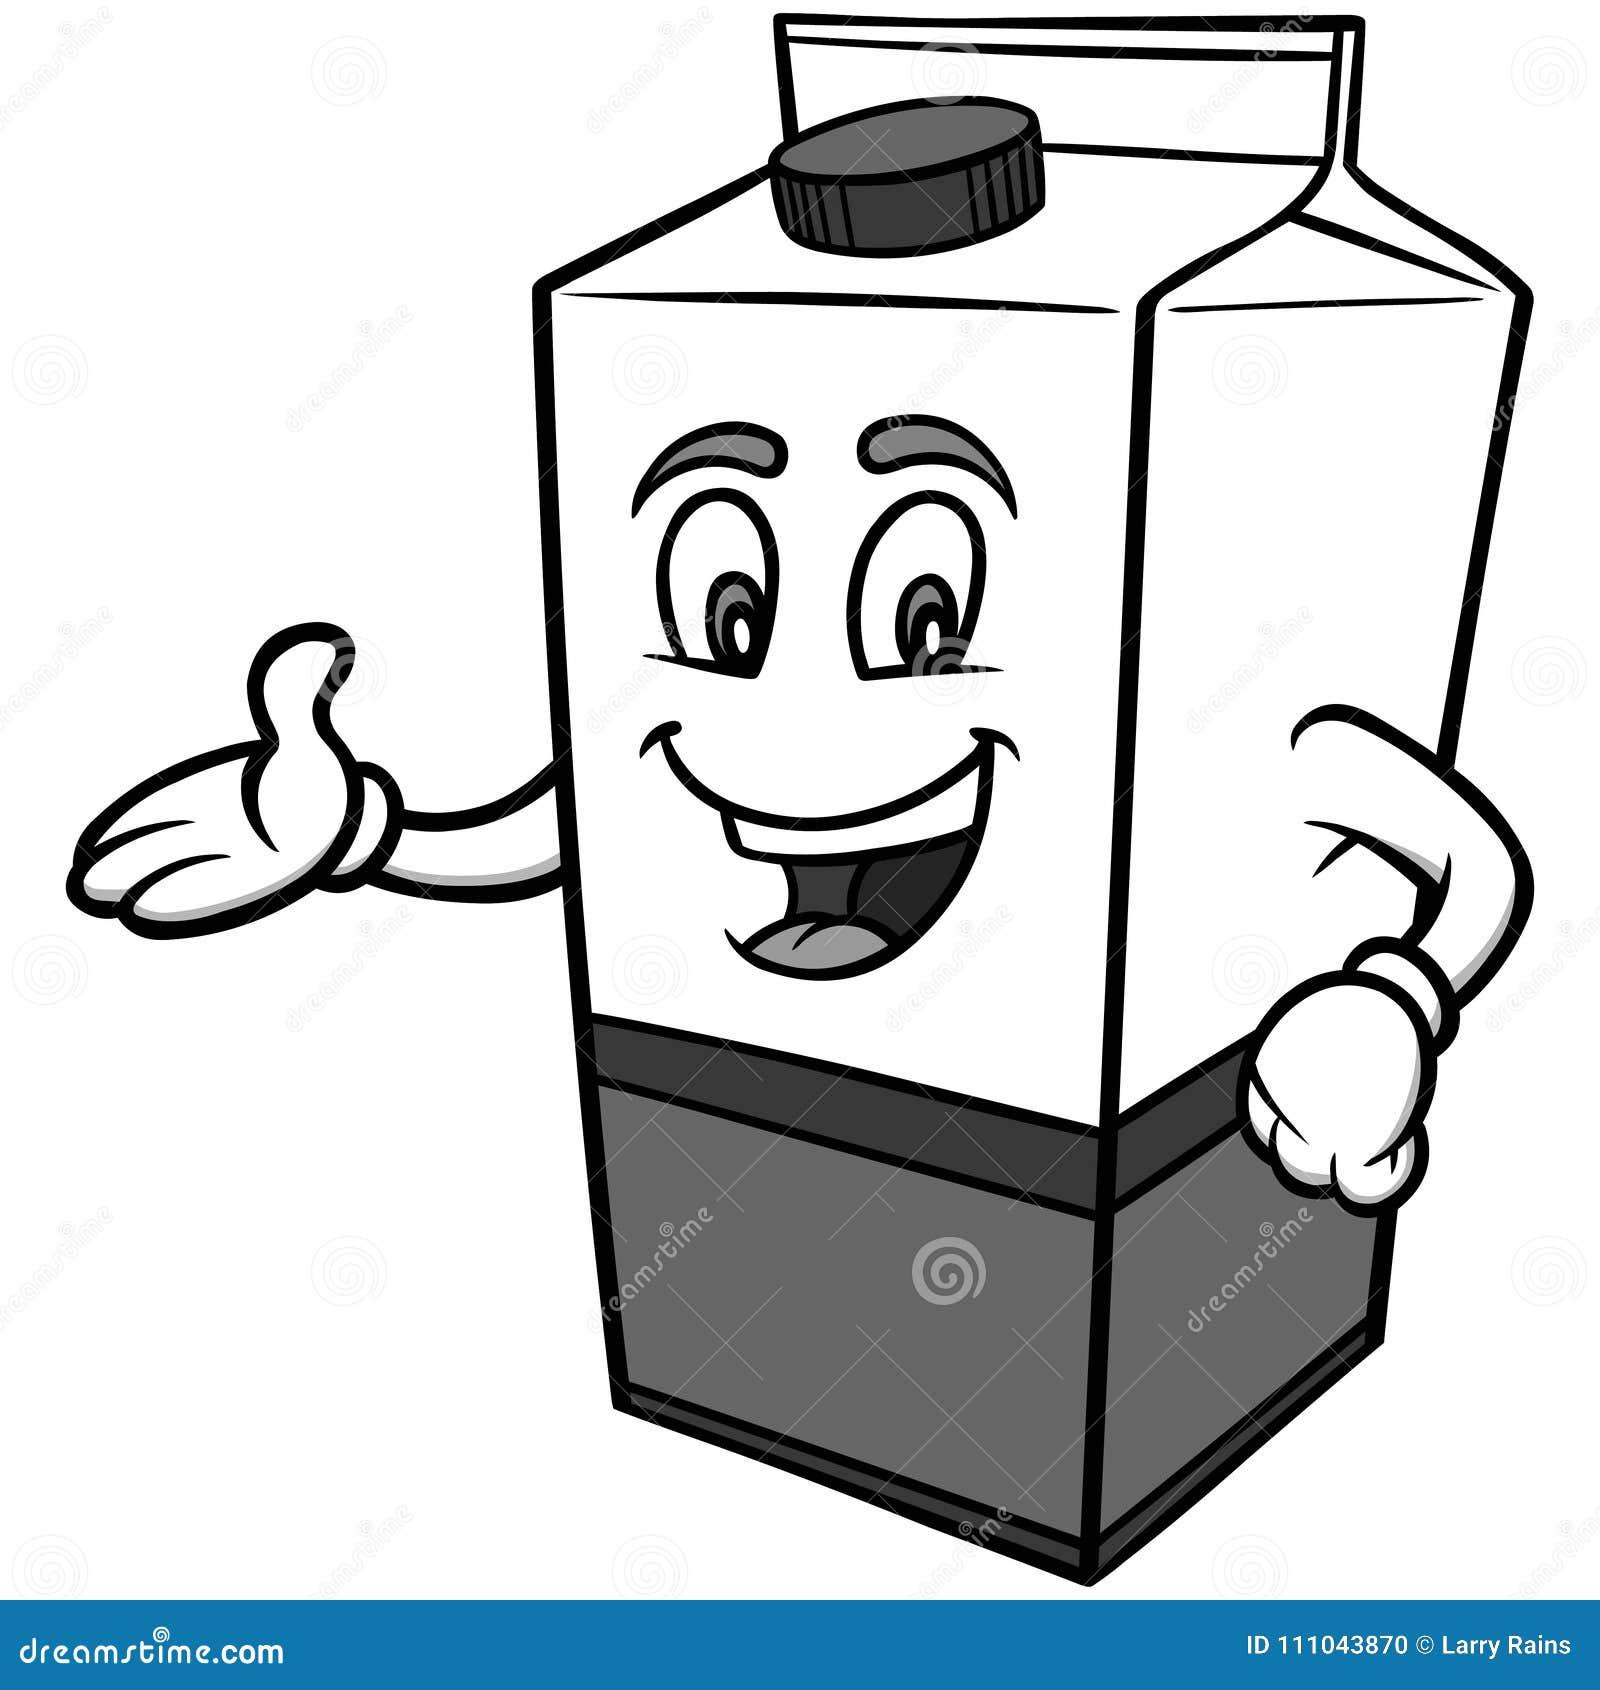 Milk Carton Illustration Stock Vector Illustration Of Message